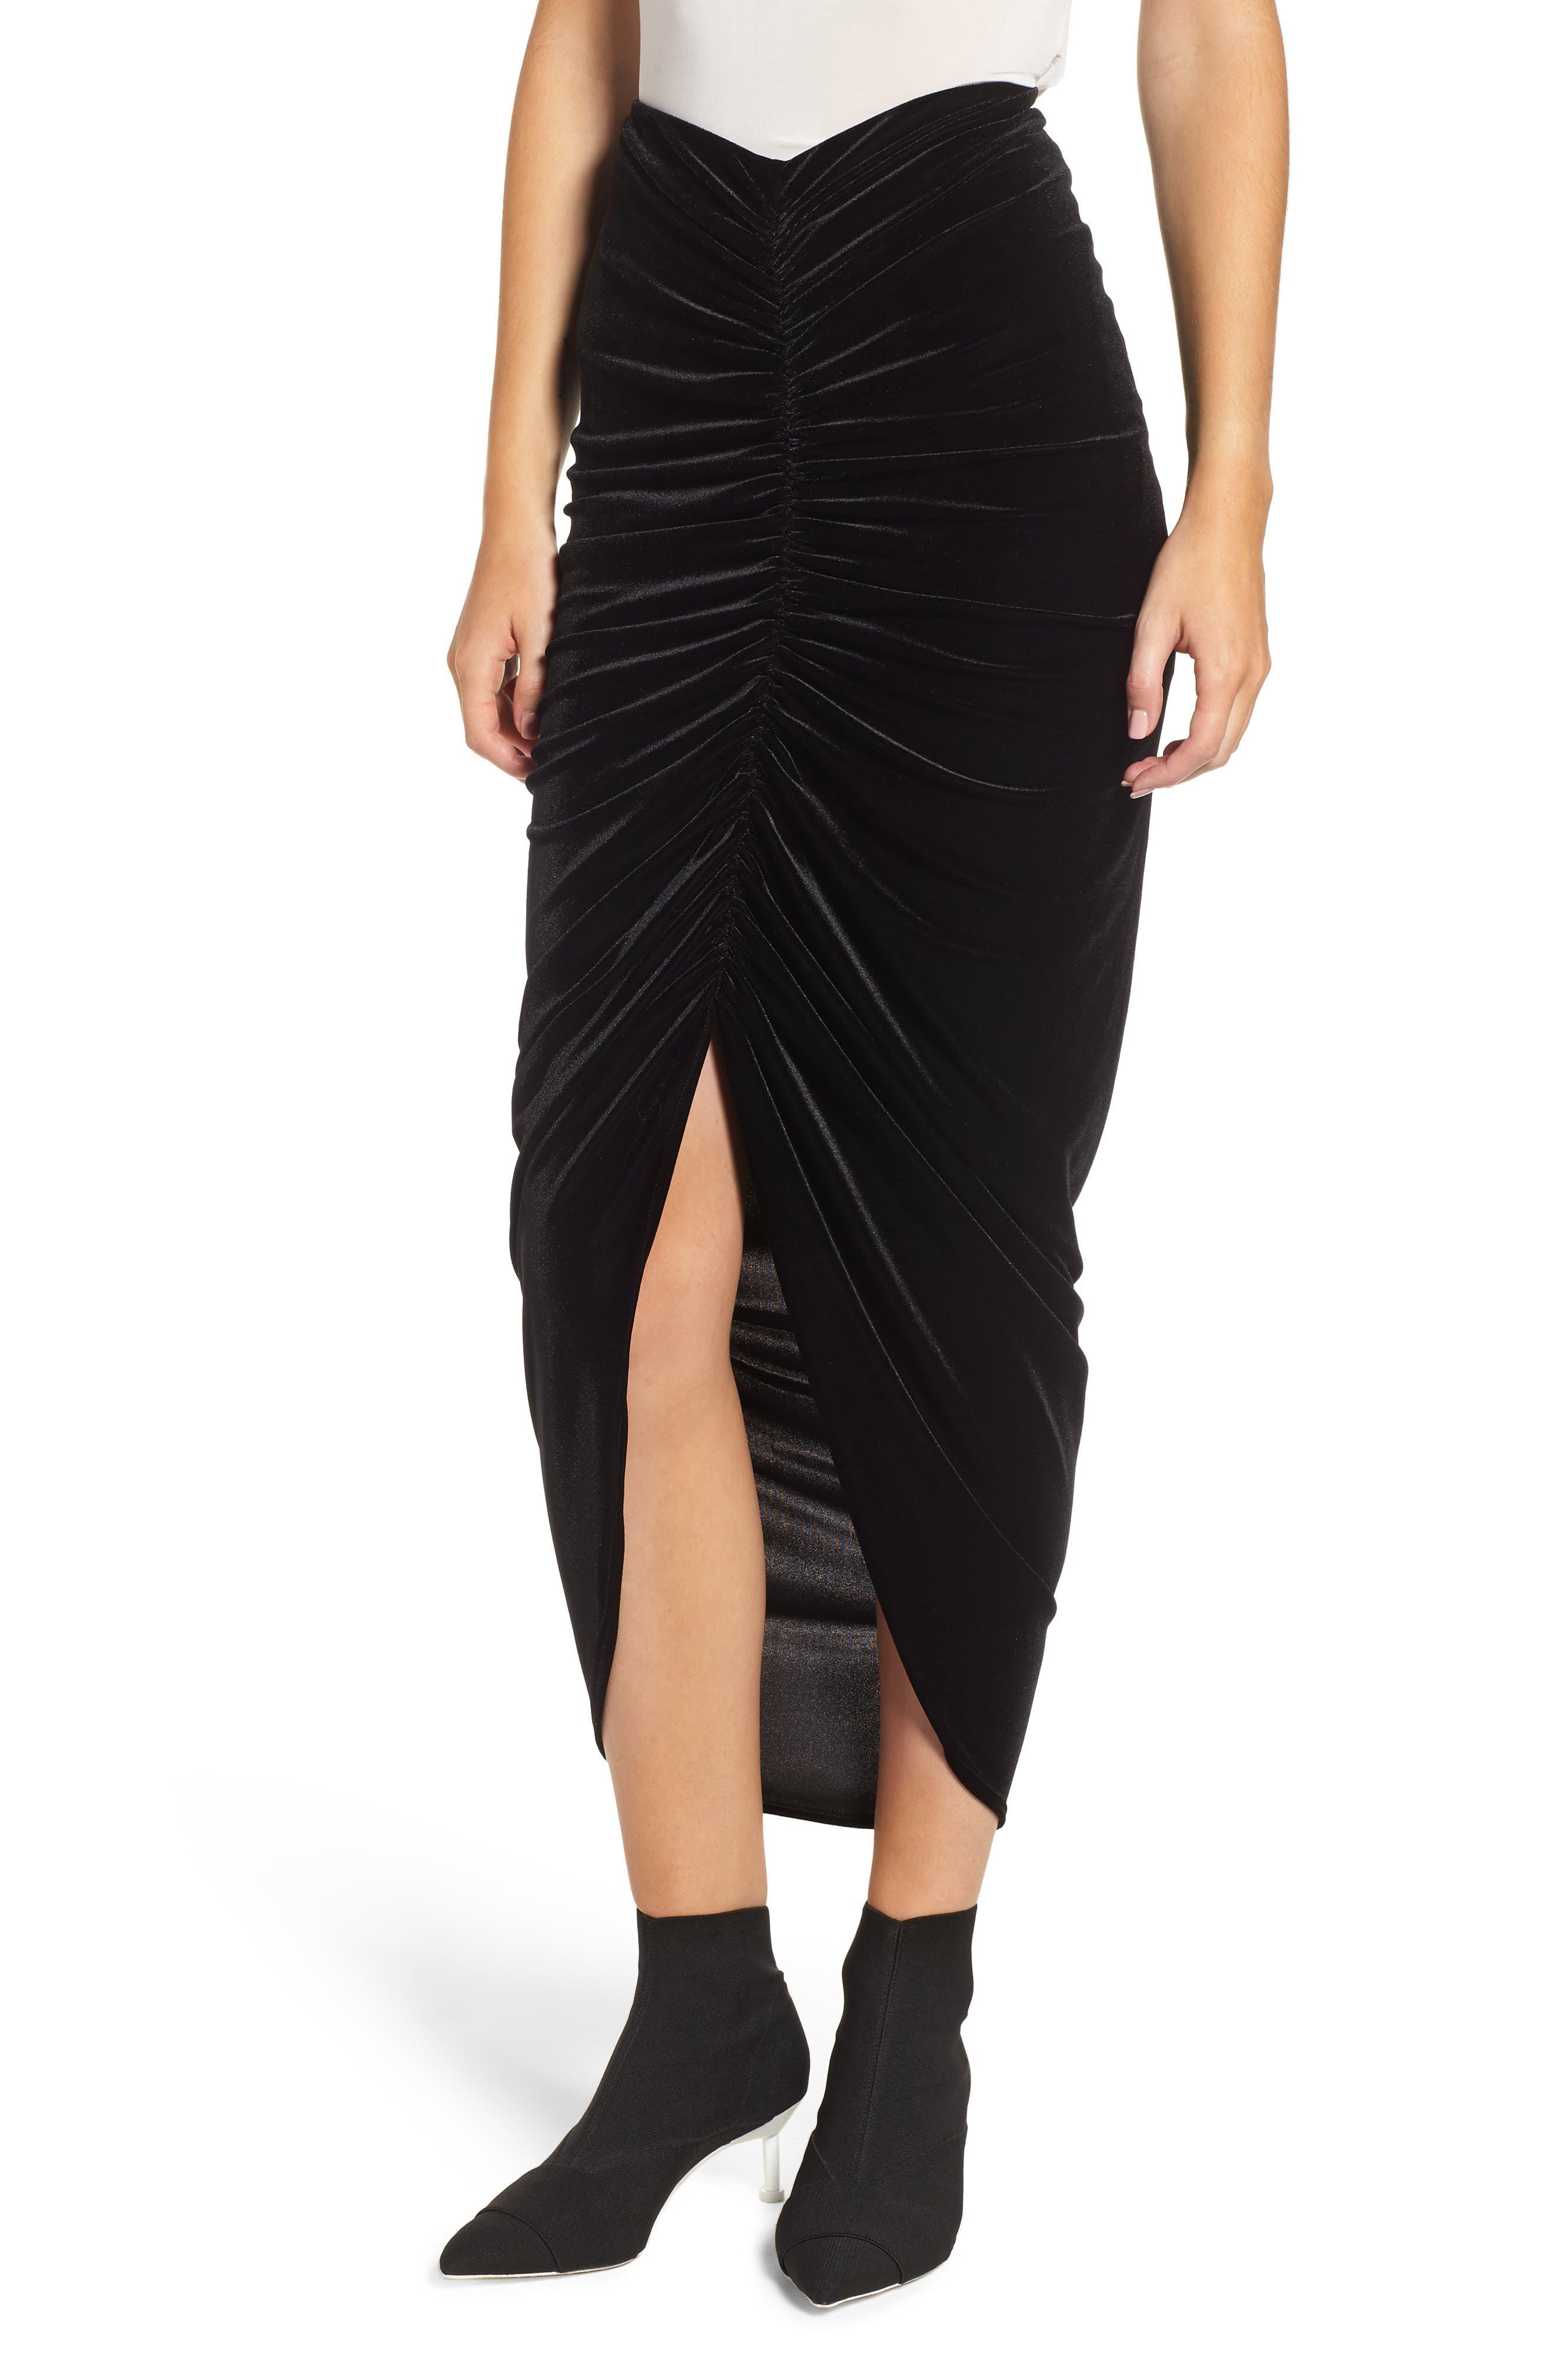 BAILEY 44 Any Seven Skirt, Main, color, 001